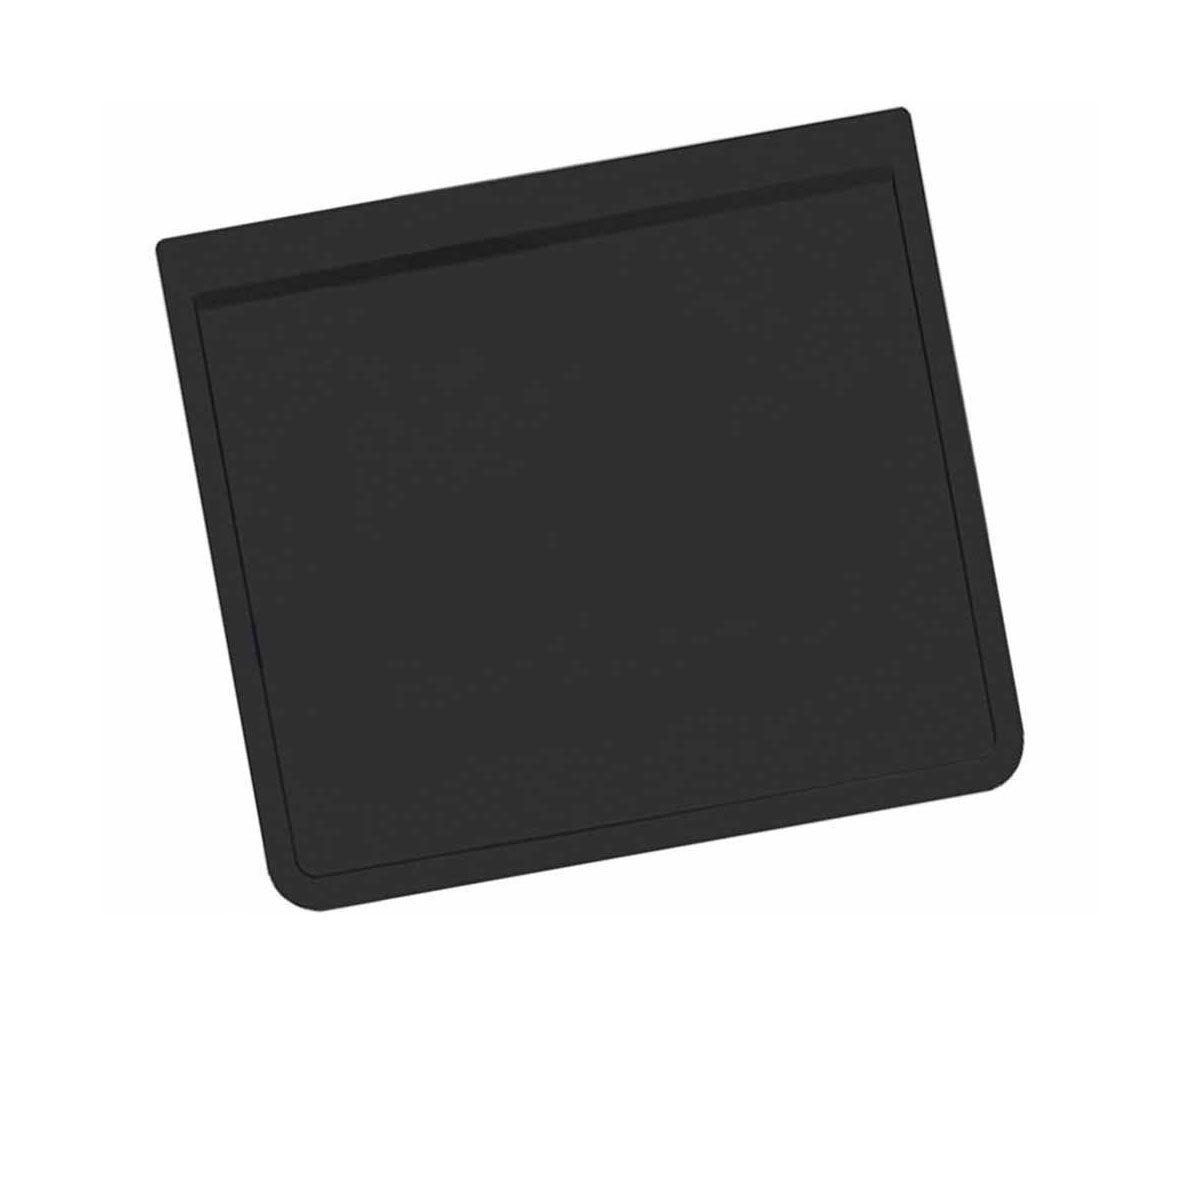 Apara Barro Injetado Liso (50x50)